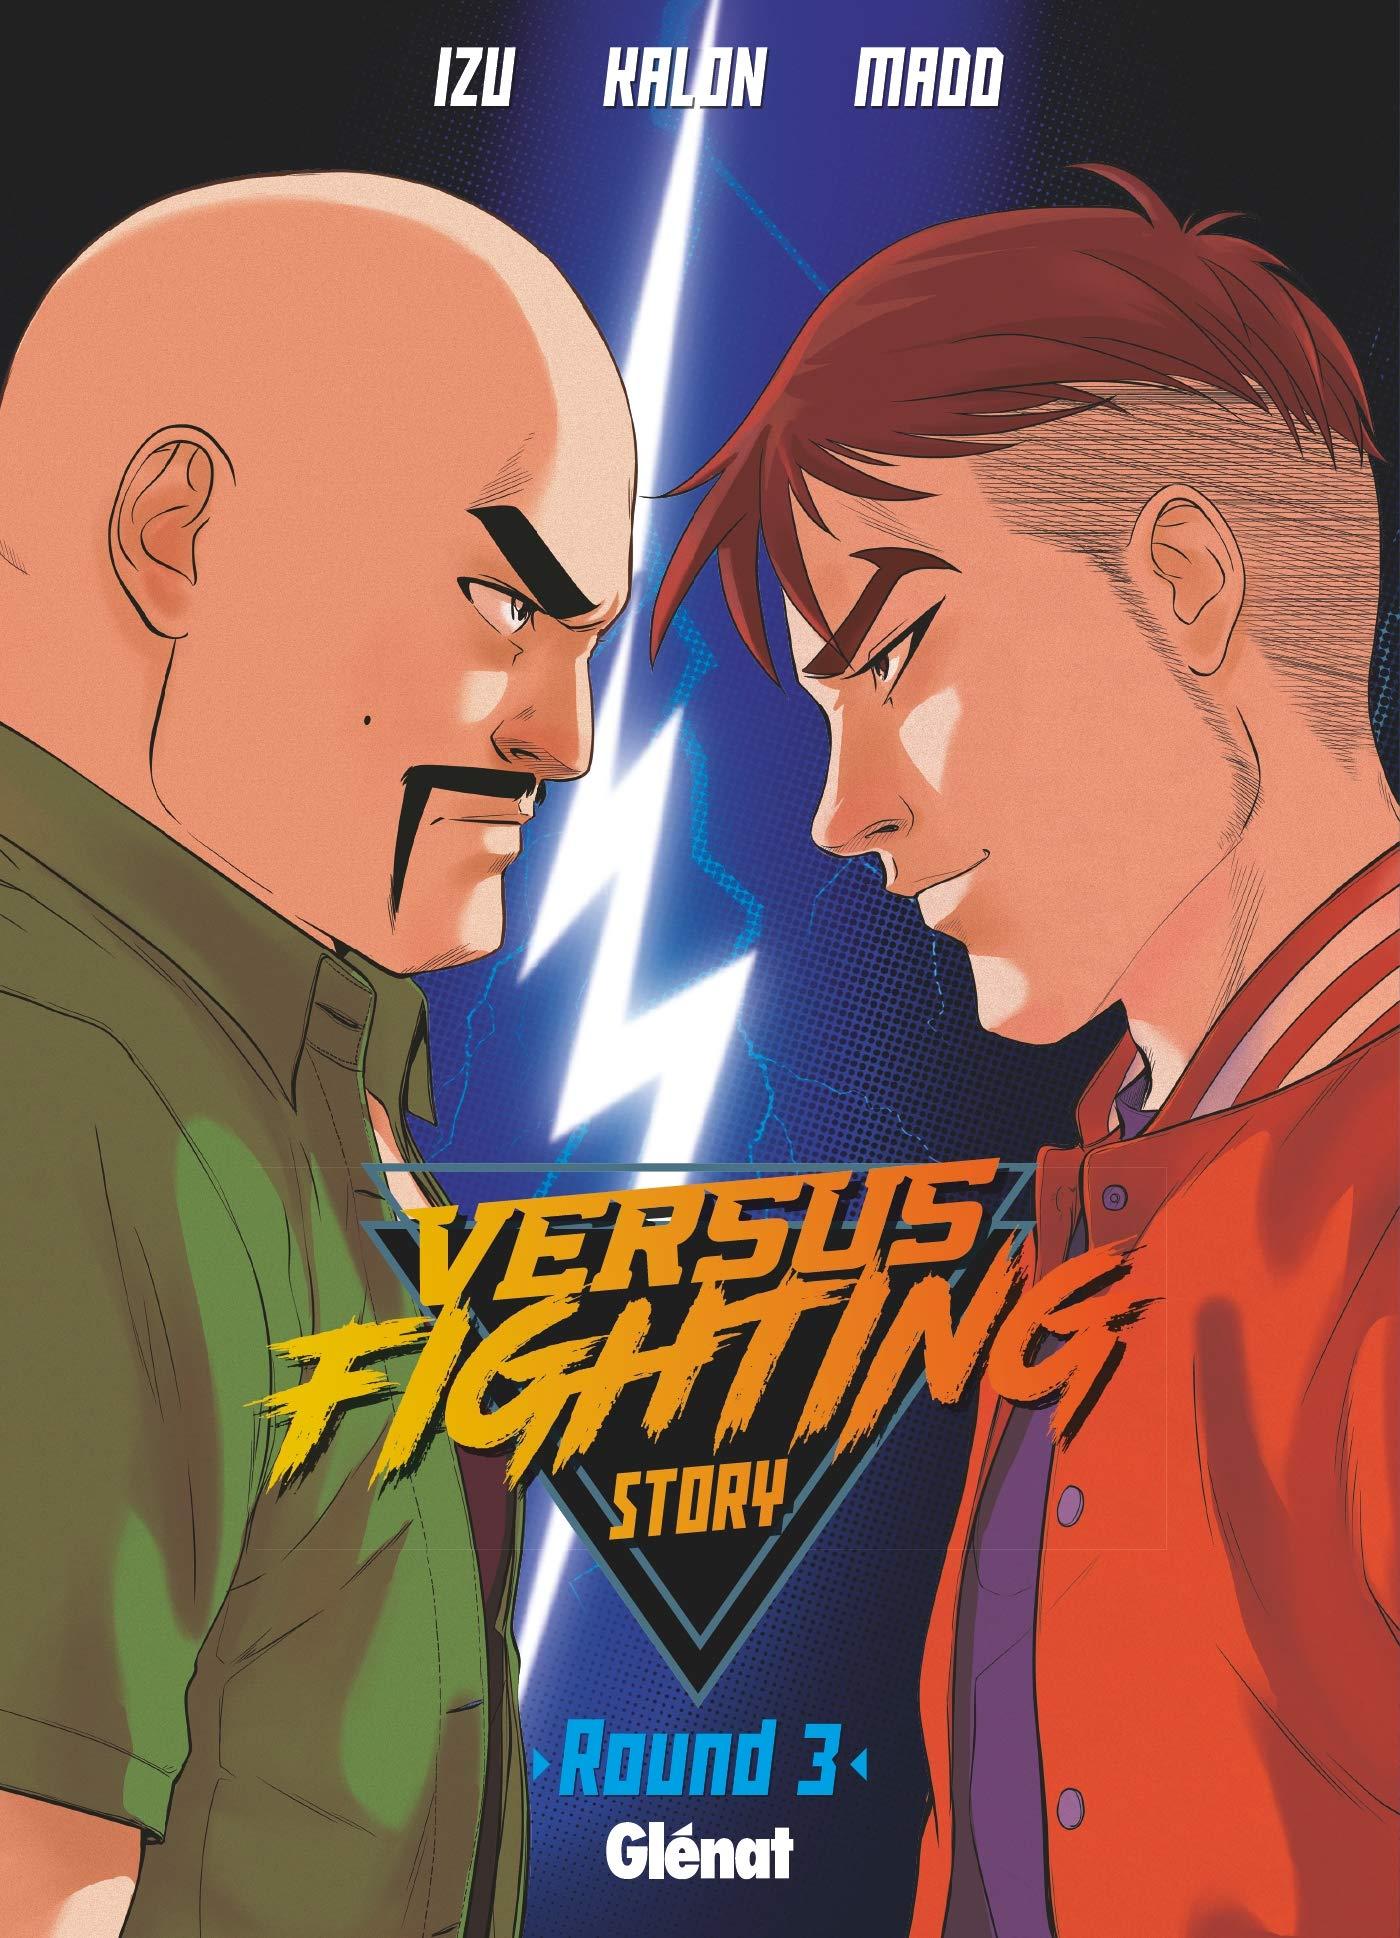 Versus fighting story 3